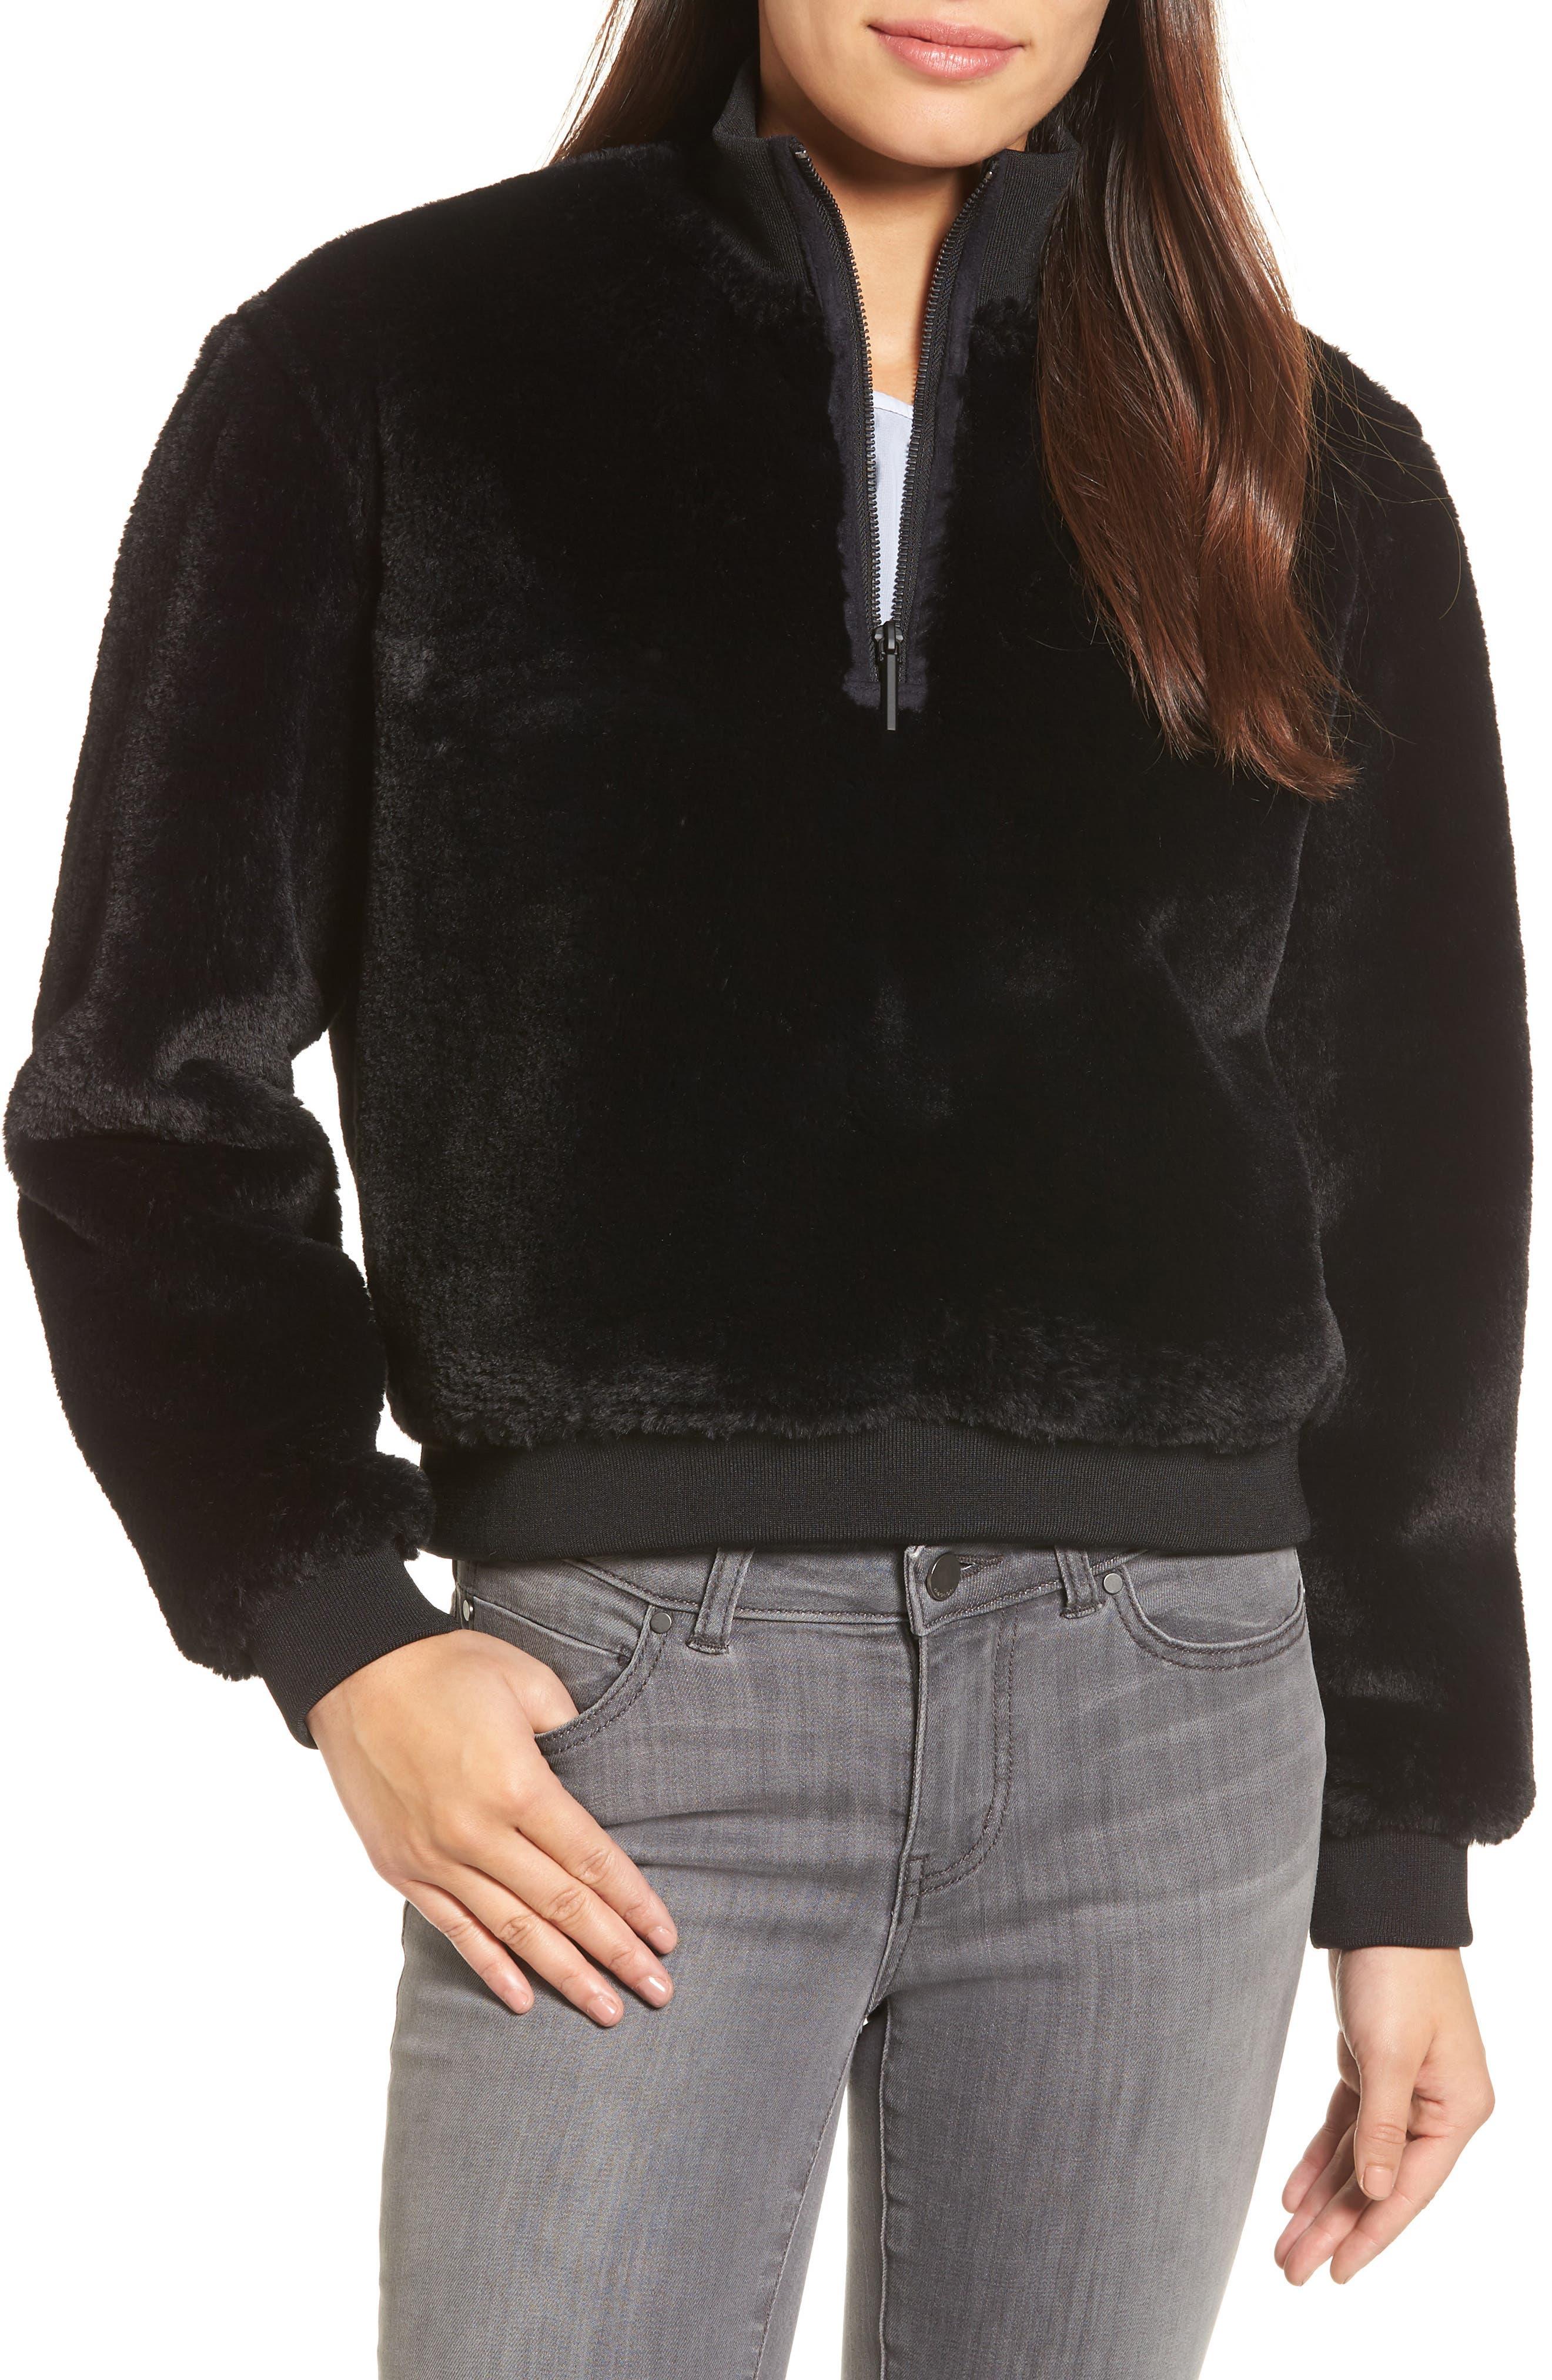 KENNETH COLE NEW YORK, Half-Zip Faux Fur Sweatshirt, Main thumbnail 1, color, BLACK